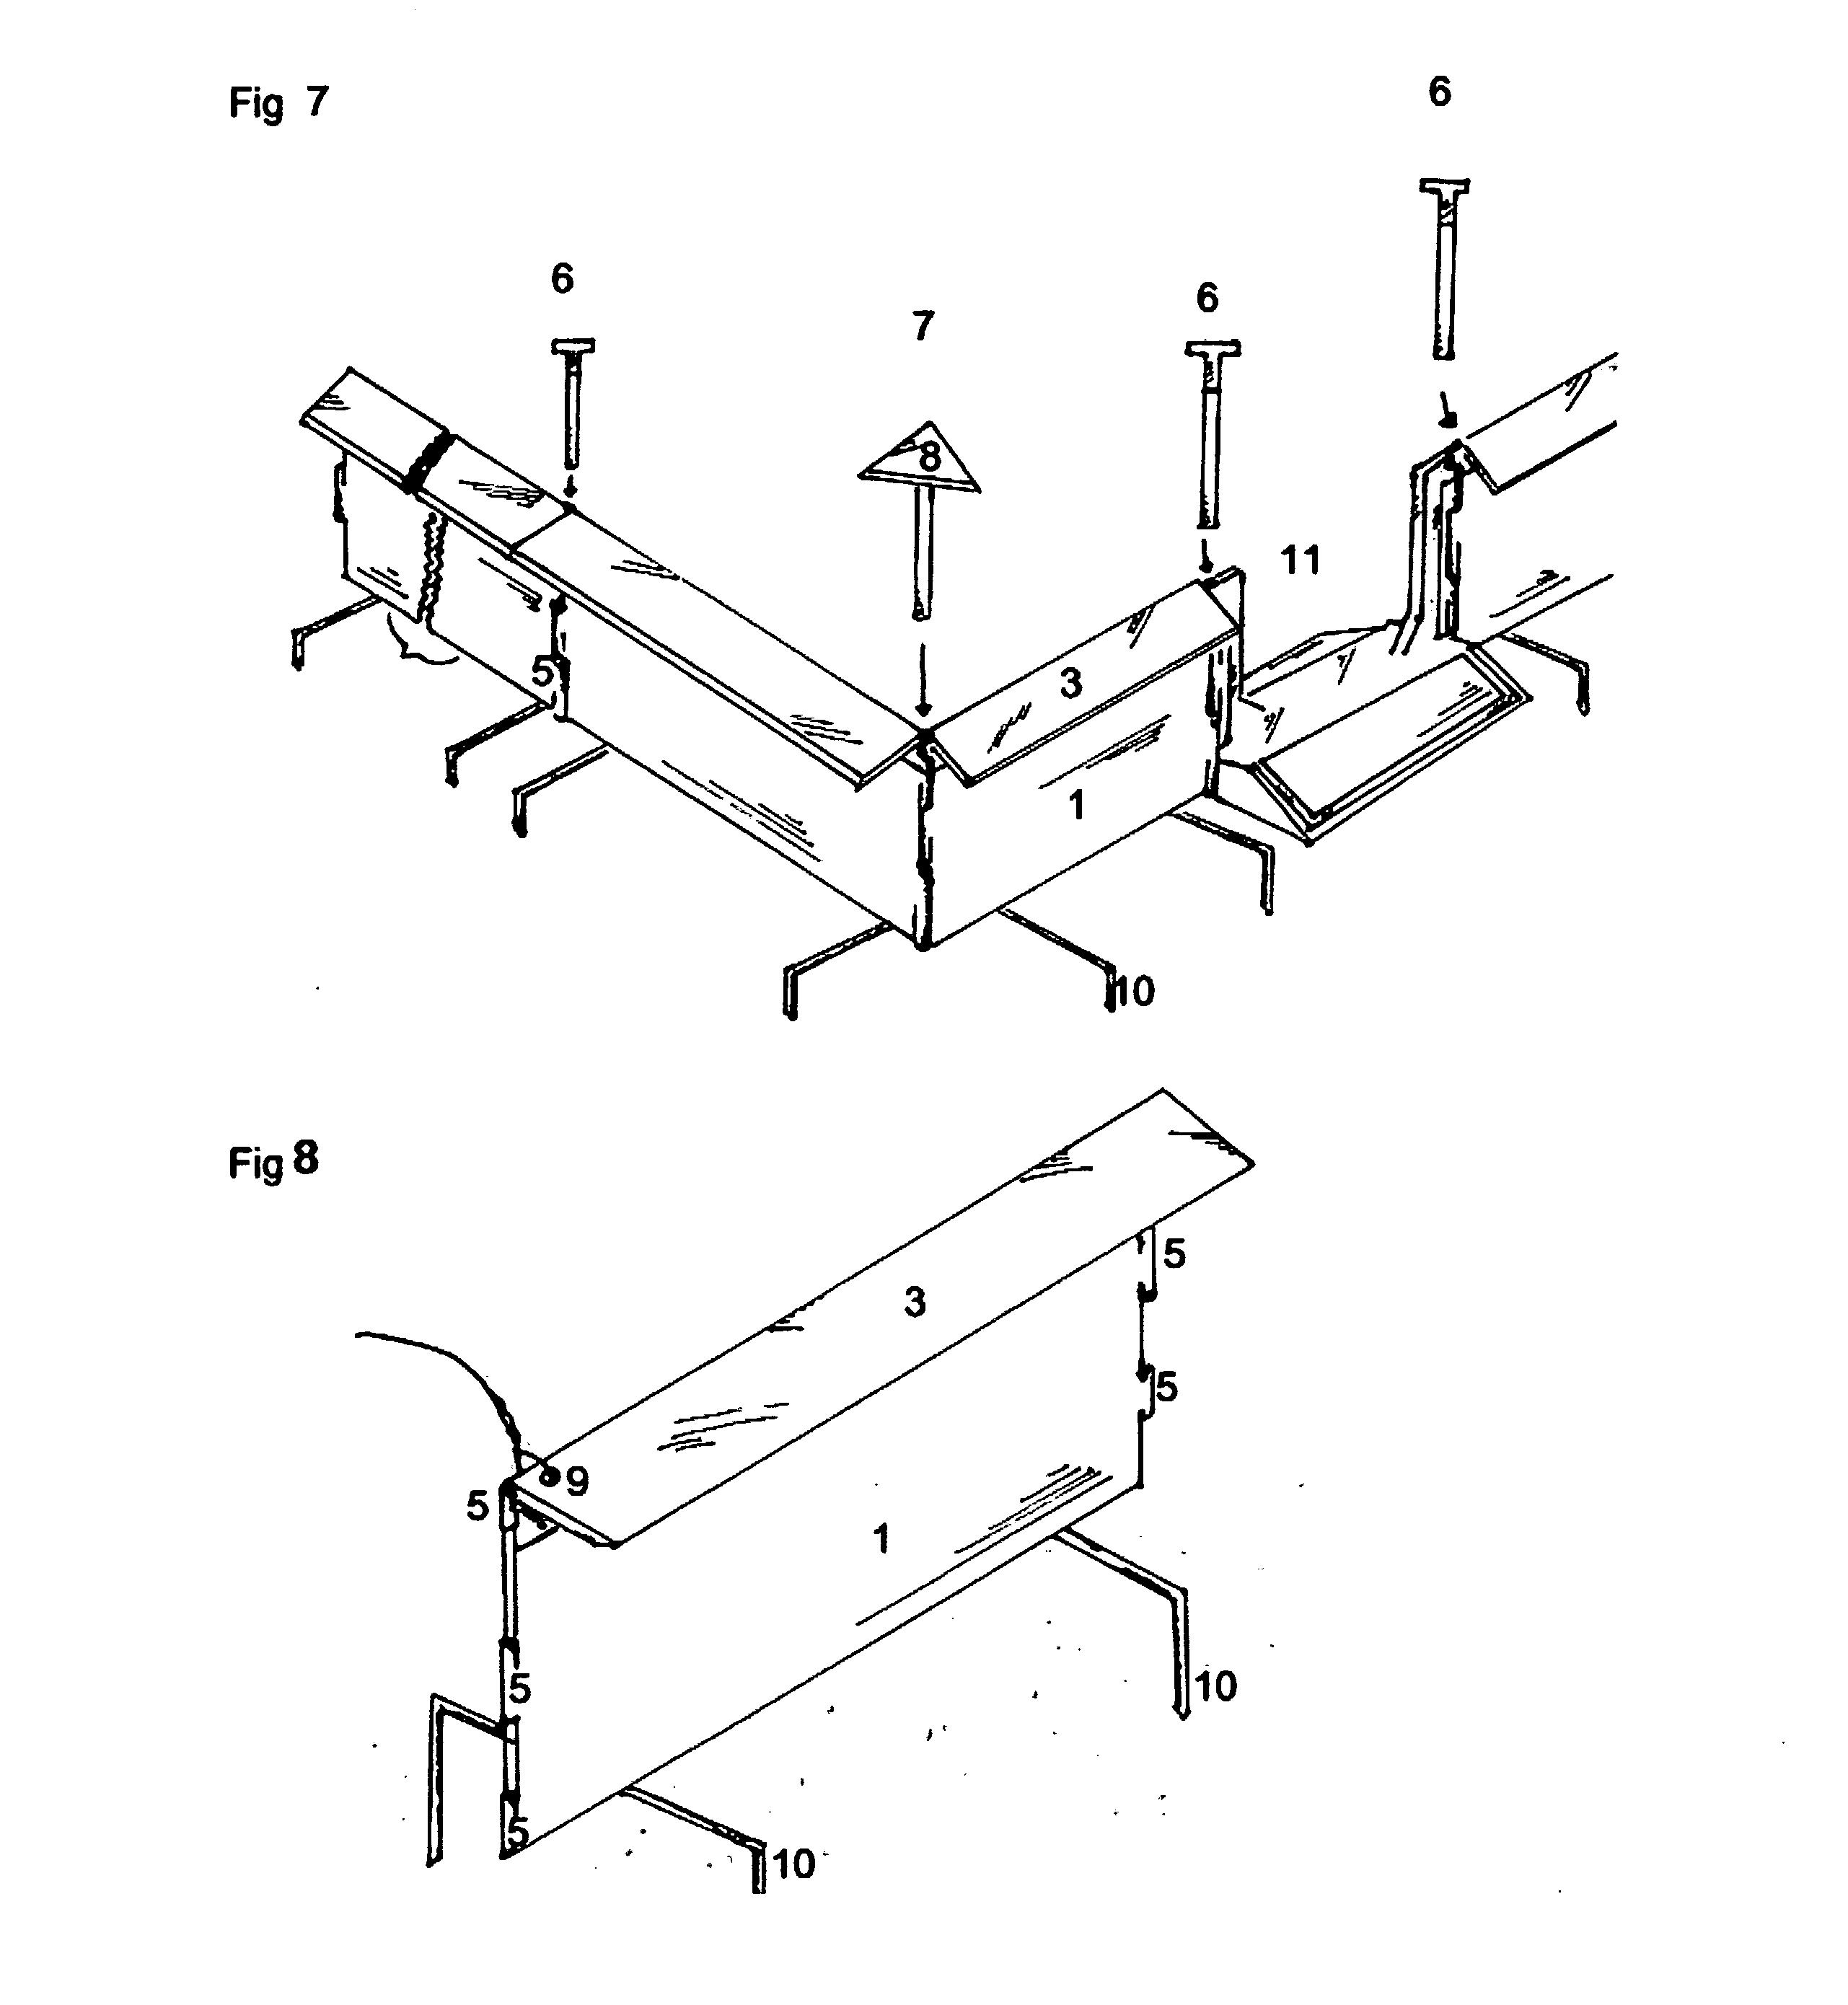 patent us20130026432 - electric snake deterrent fencing